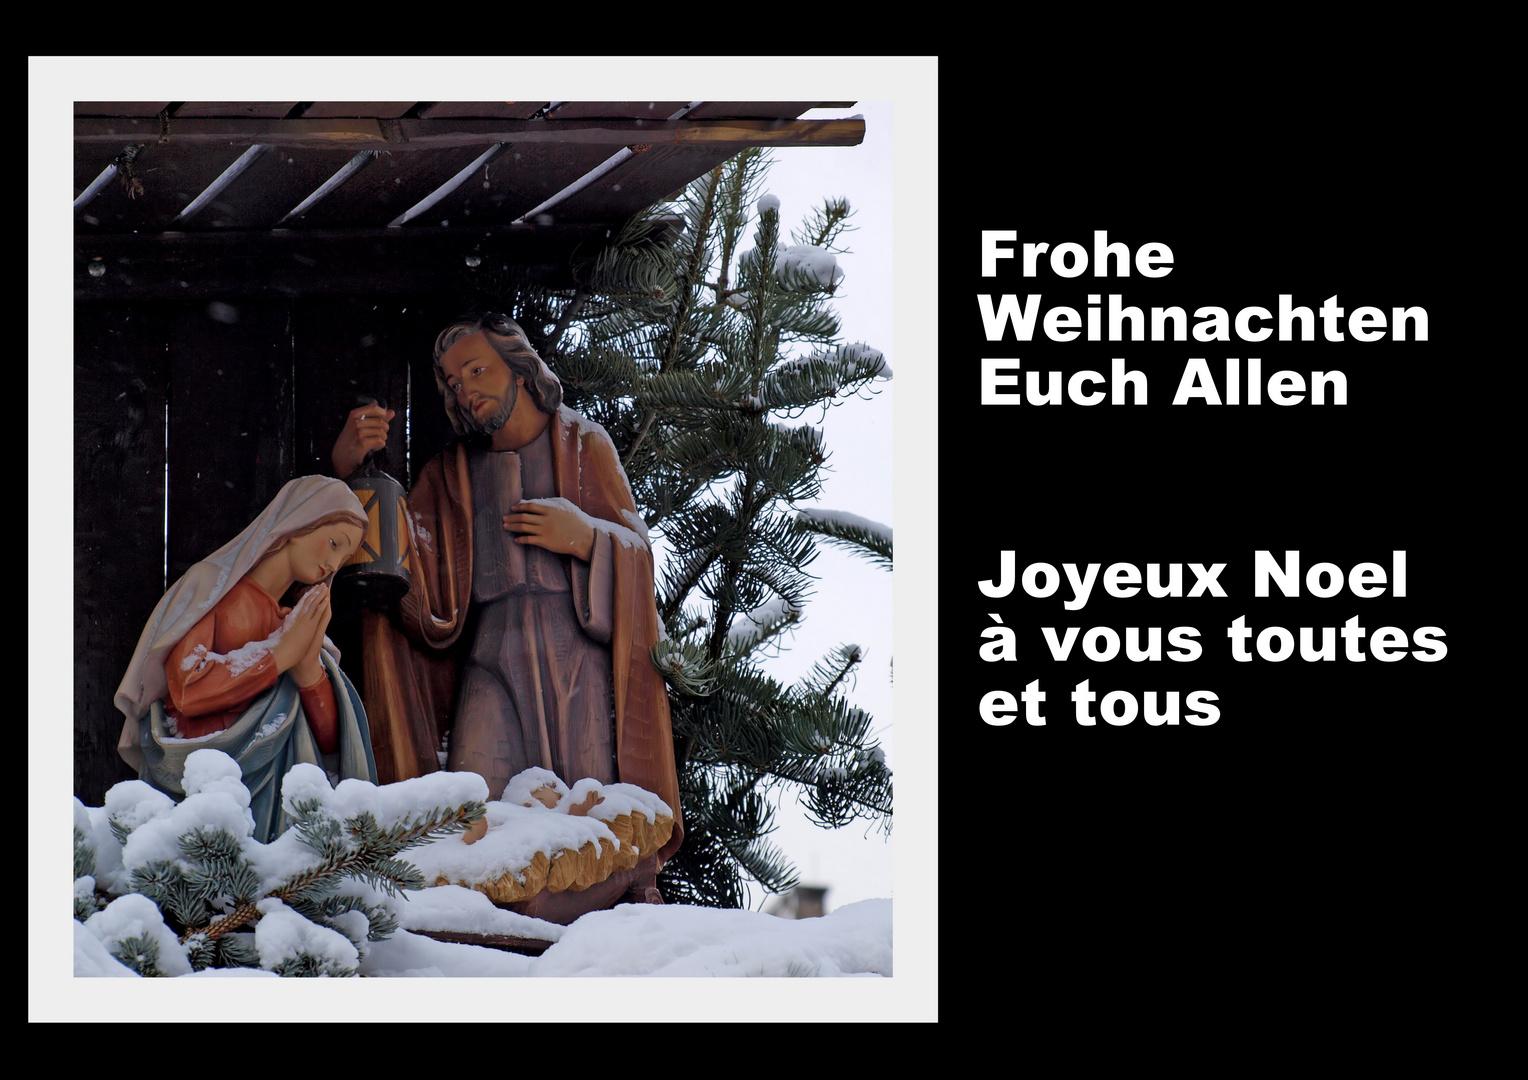 Frohe Weihnachten - Joyeux Noel